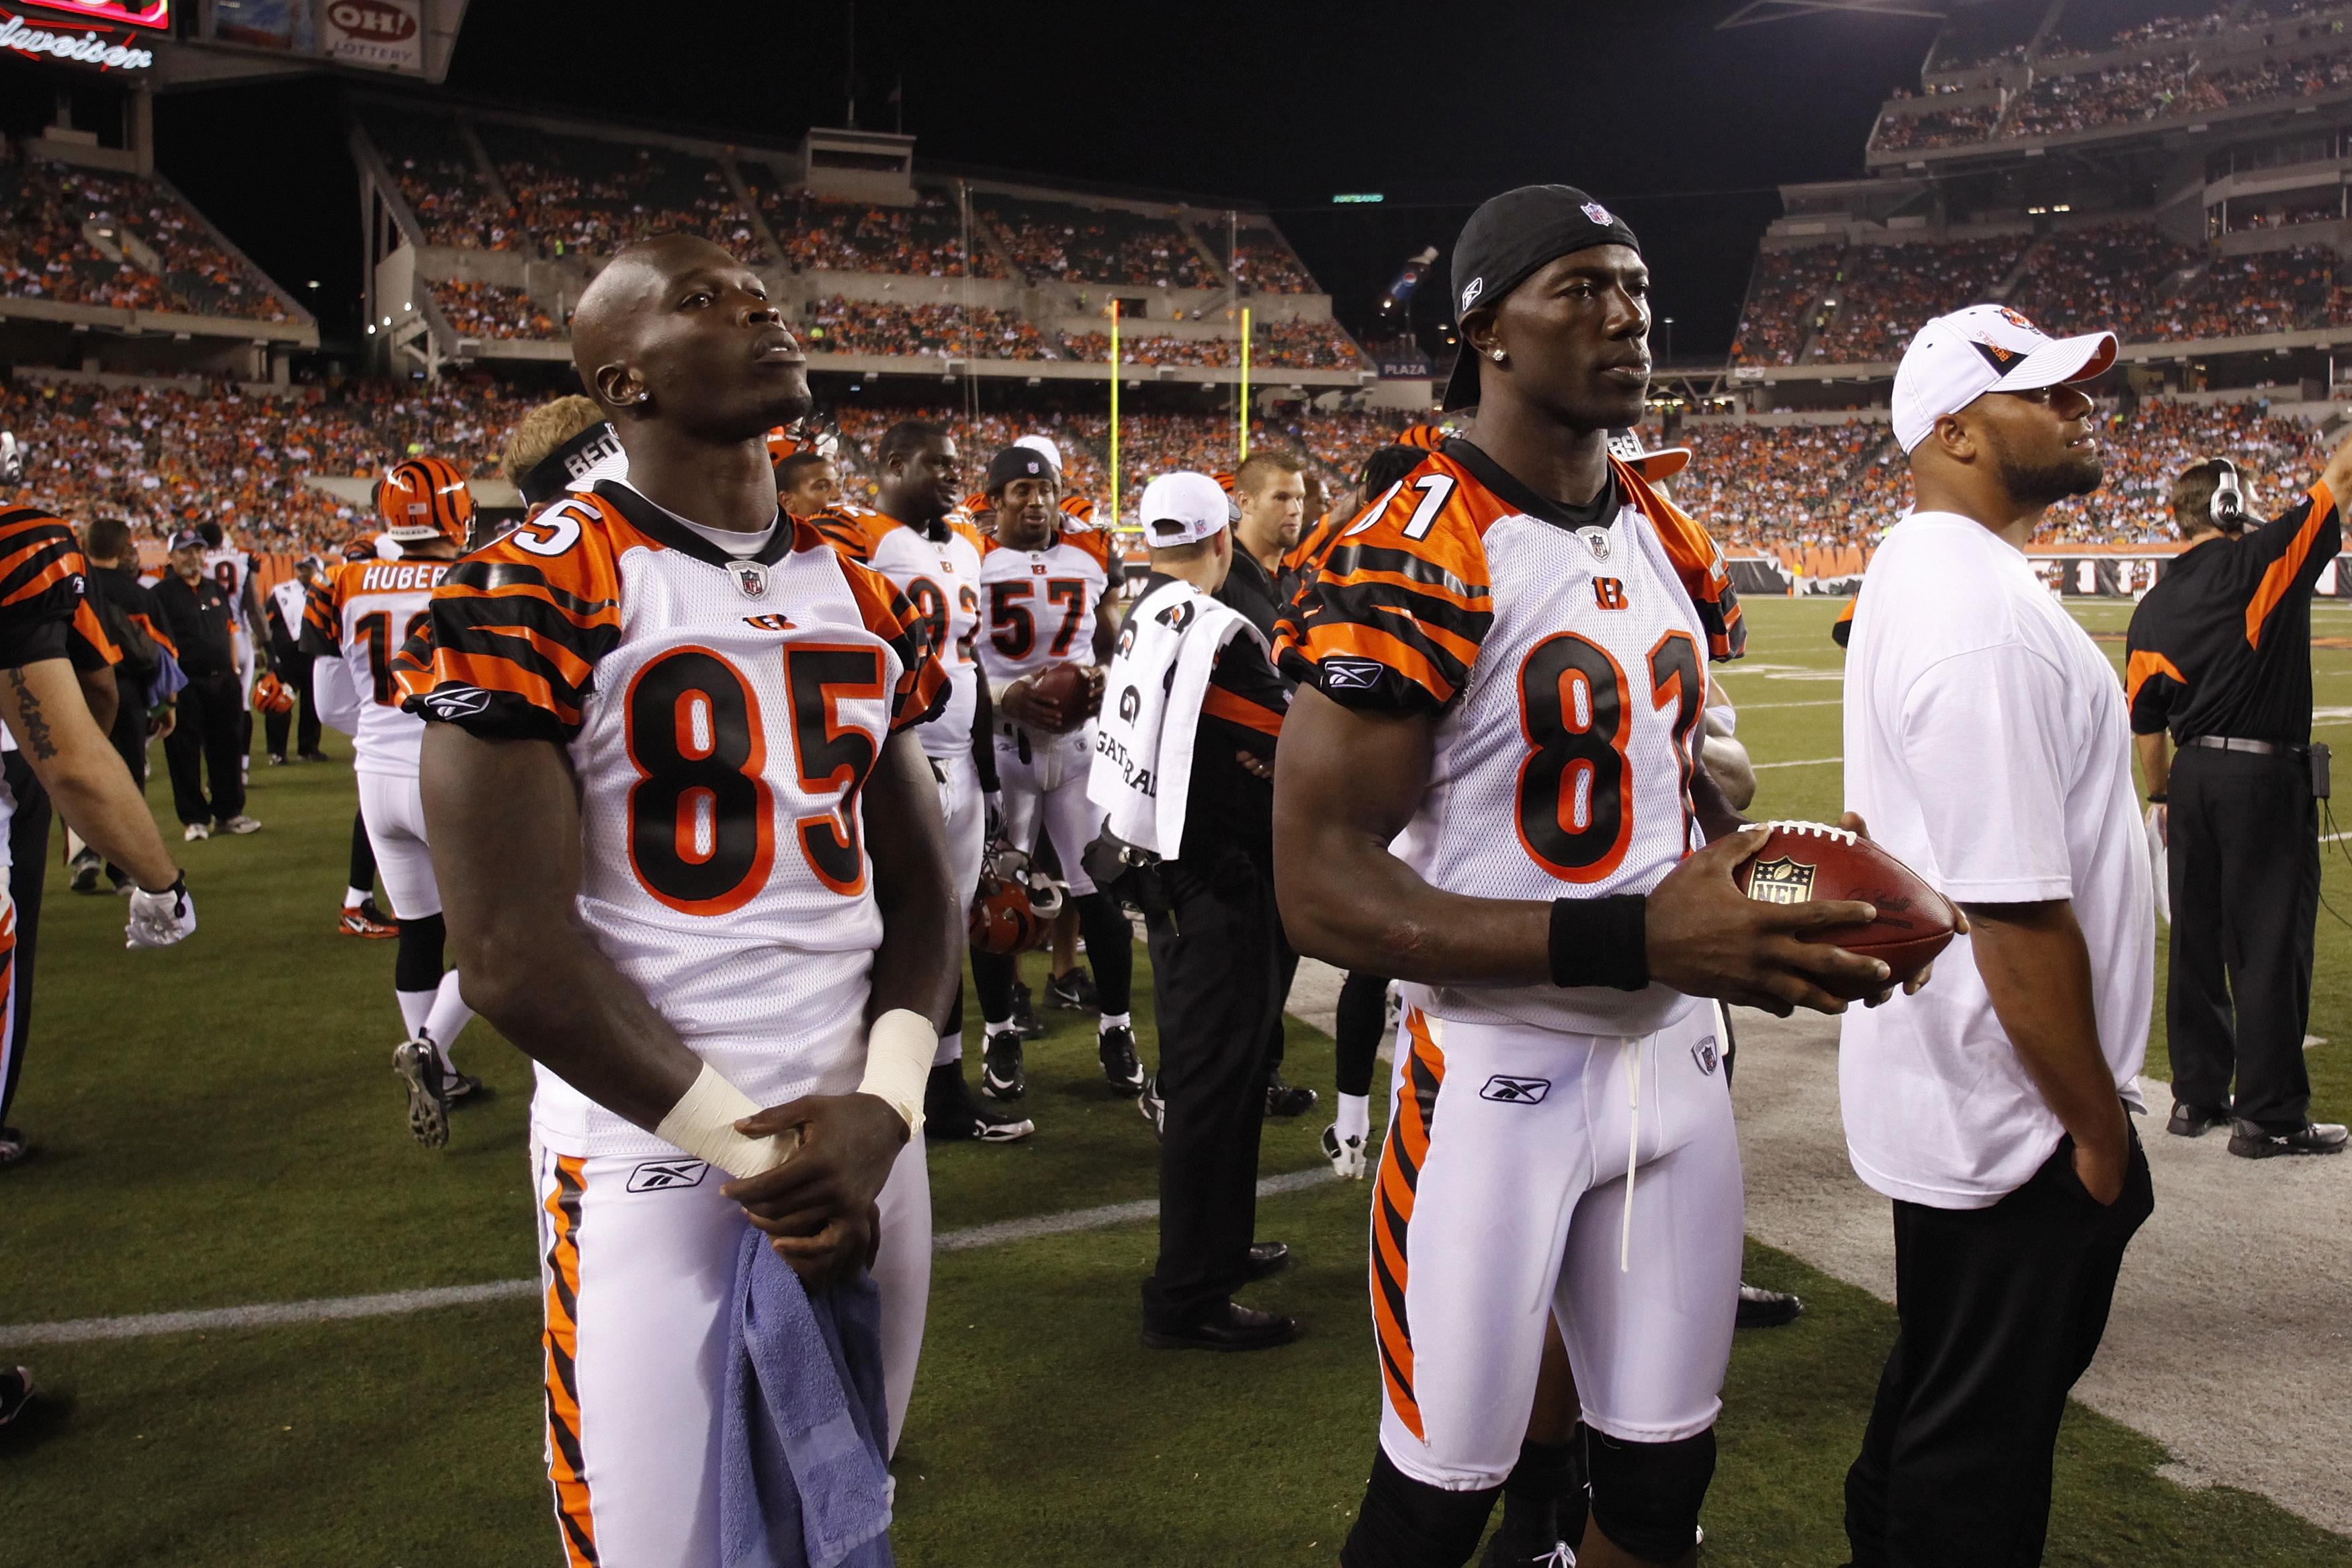 CINCINNATI, OH - AUGUST 15: Terrell Owens #81 and Chad Ochocinco #85 of the Cincinnati Bengals look on during the preseason game against the Denver Broncos at Paul Brown Stadium on August 15, 2010 in Cincinnati, Ohio. The Bengals won 33-24. (Photo by Joe